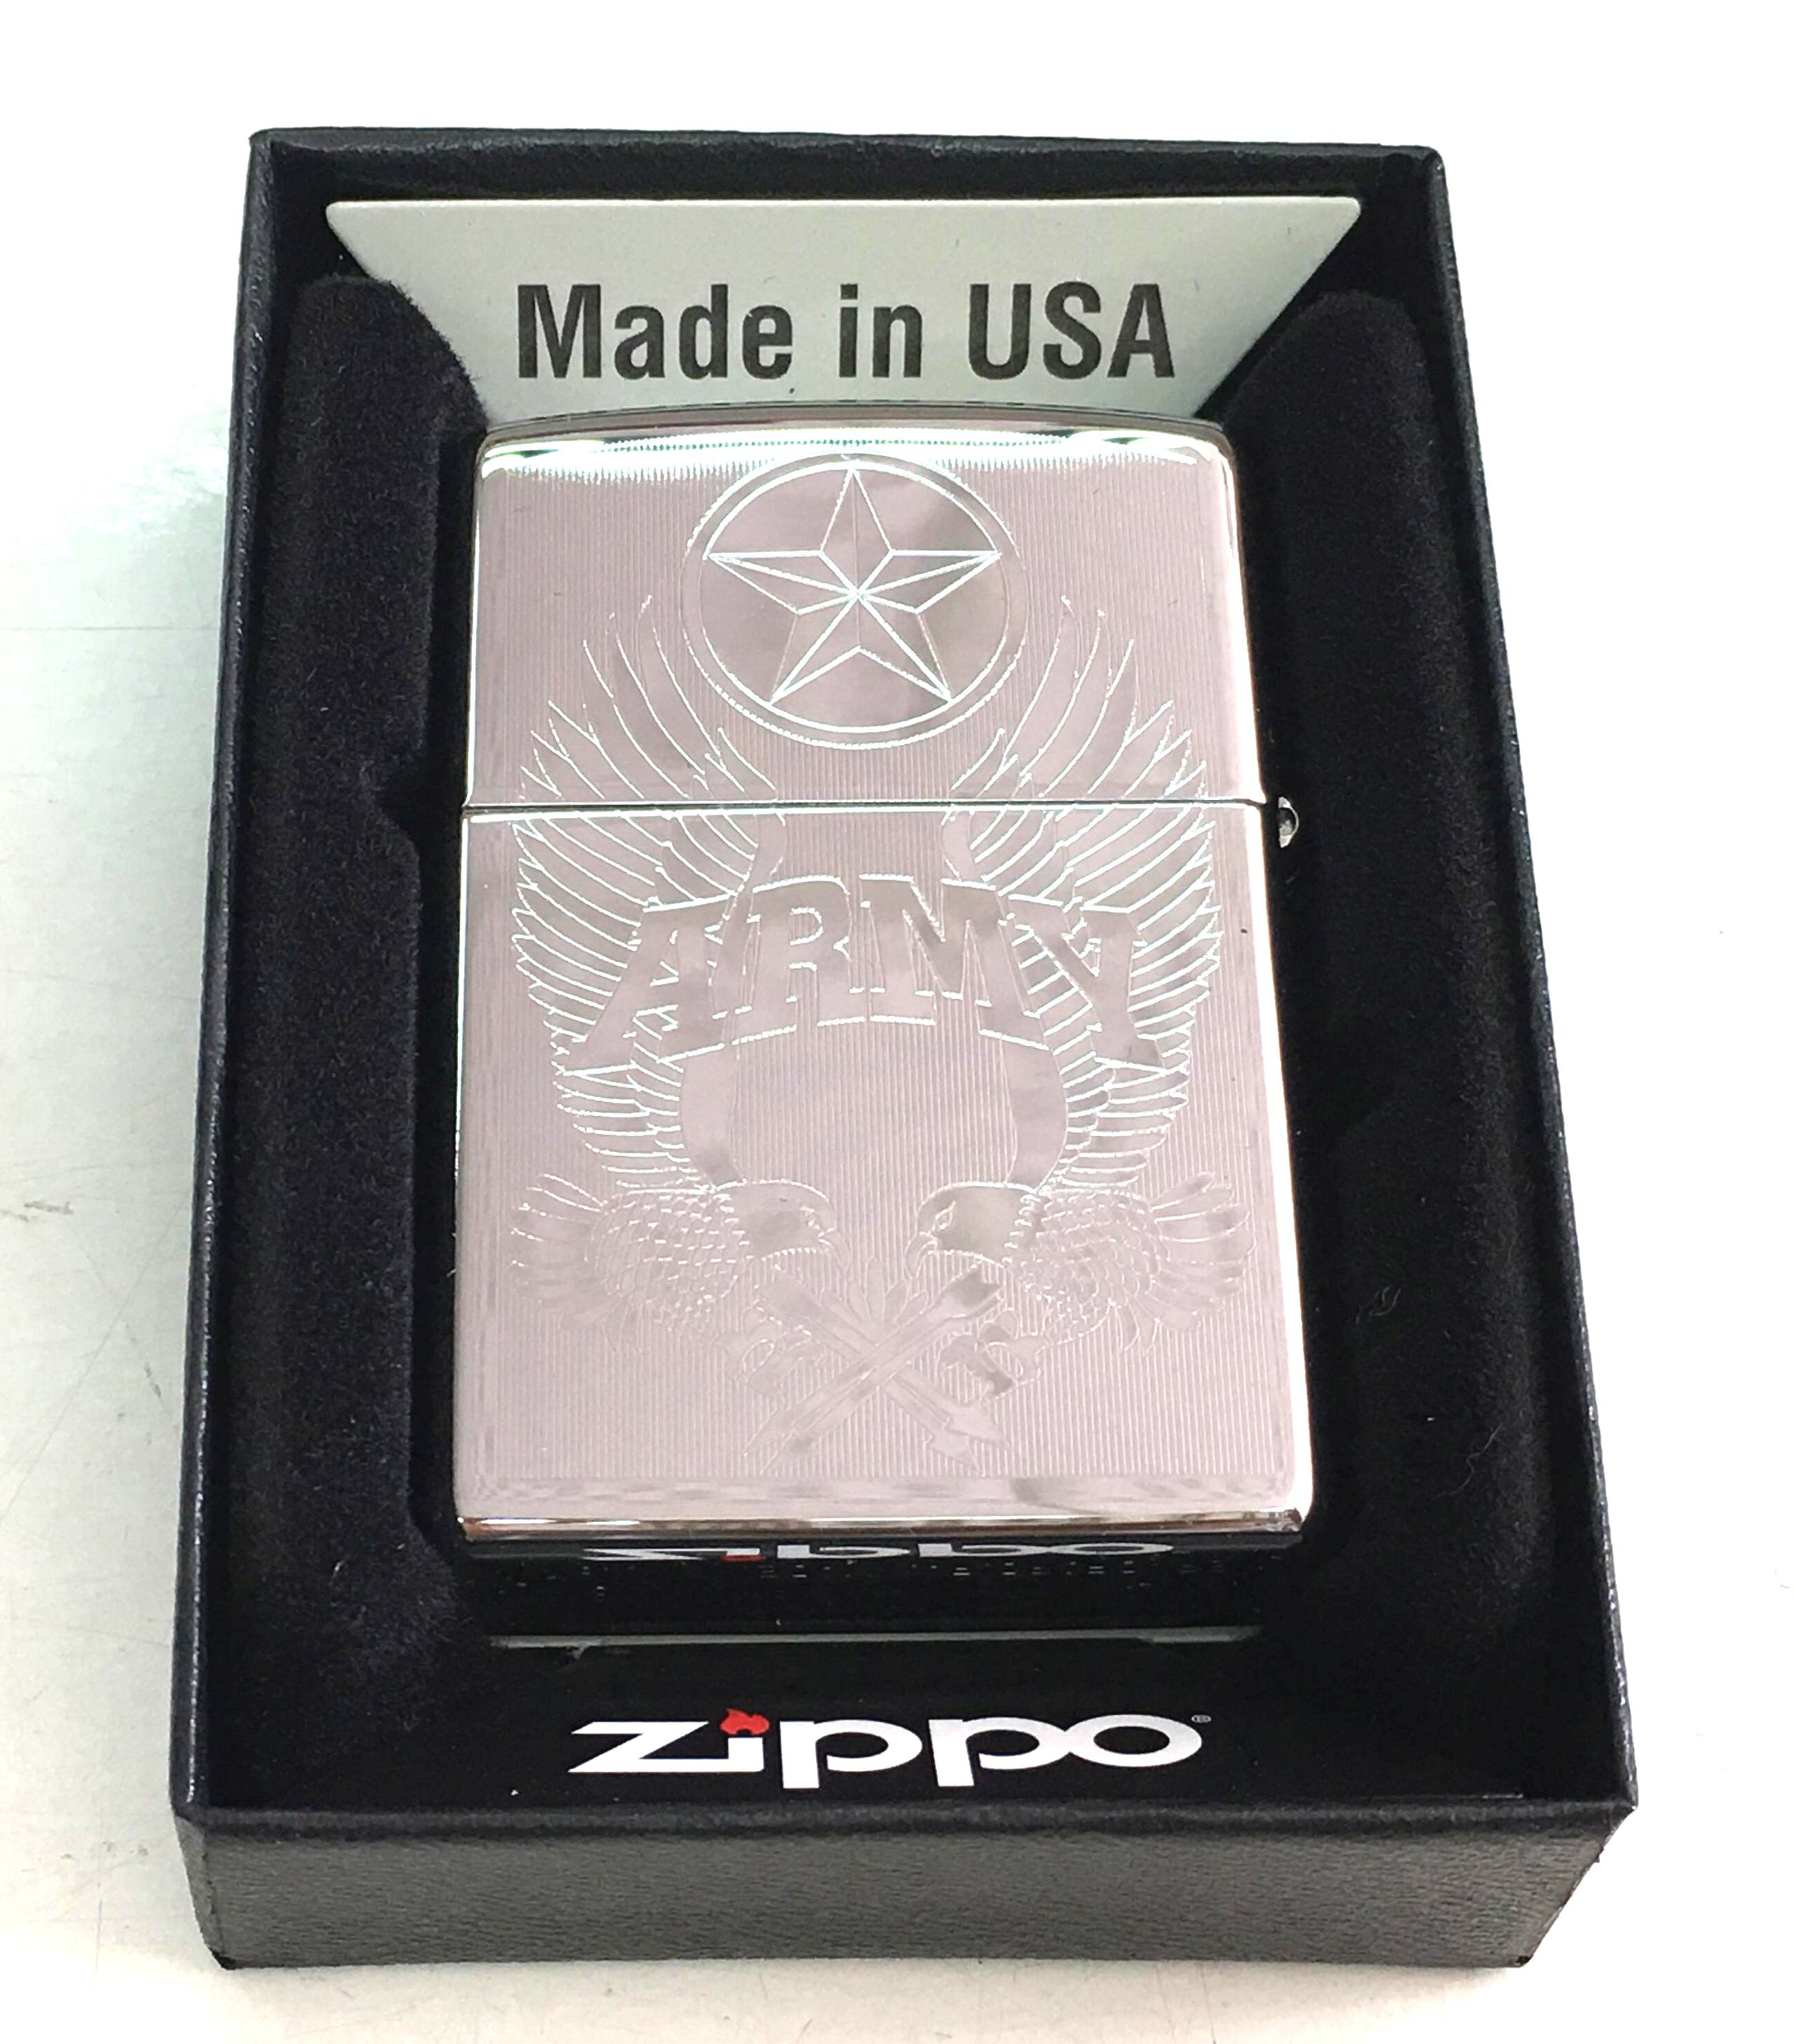 Zippo trang bong suot khac 2 mat hinh dai bang ARMY Z670